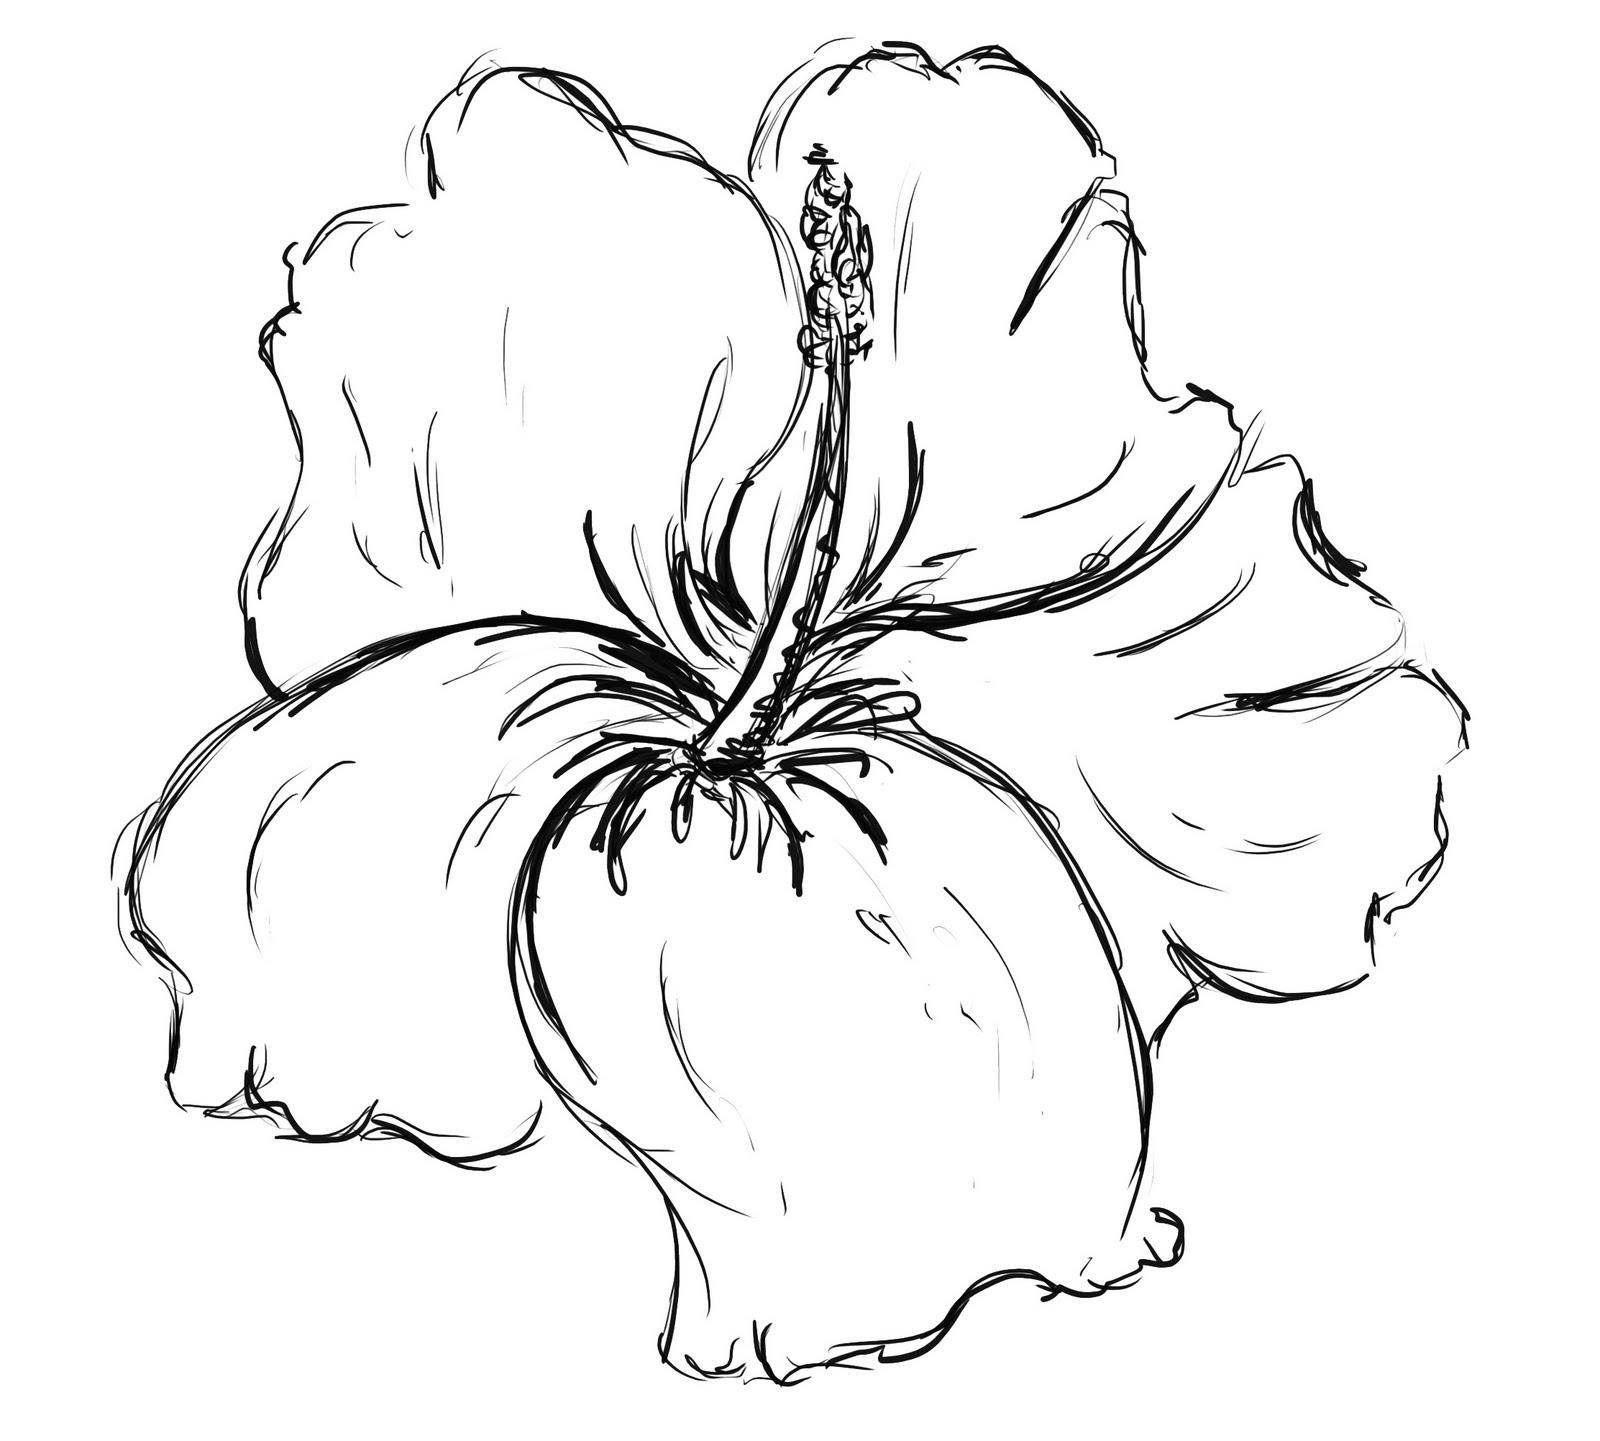 Hibiscus Flower Tattoo Drawings Free Image